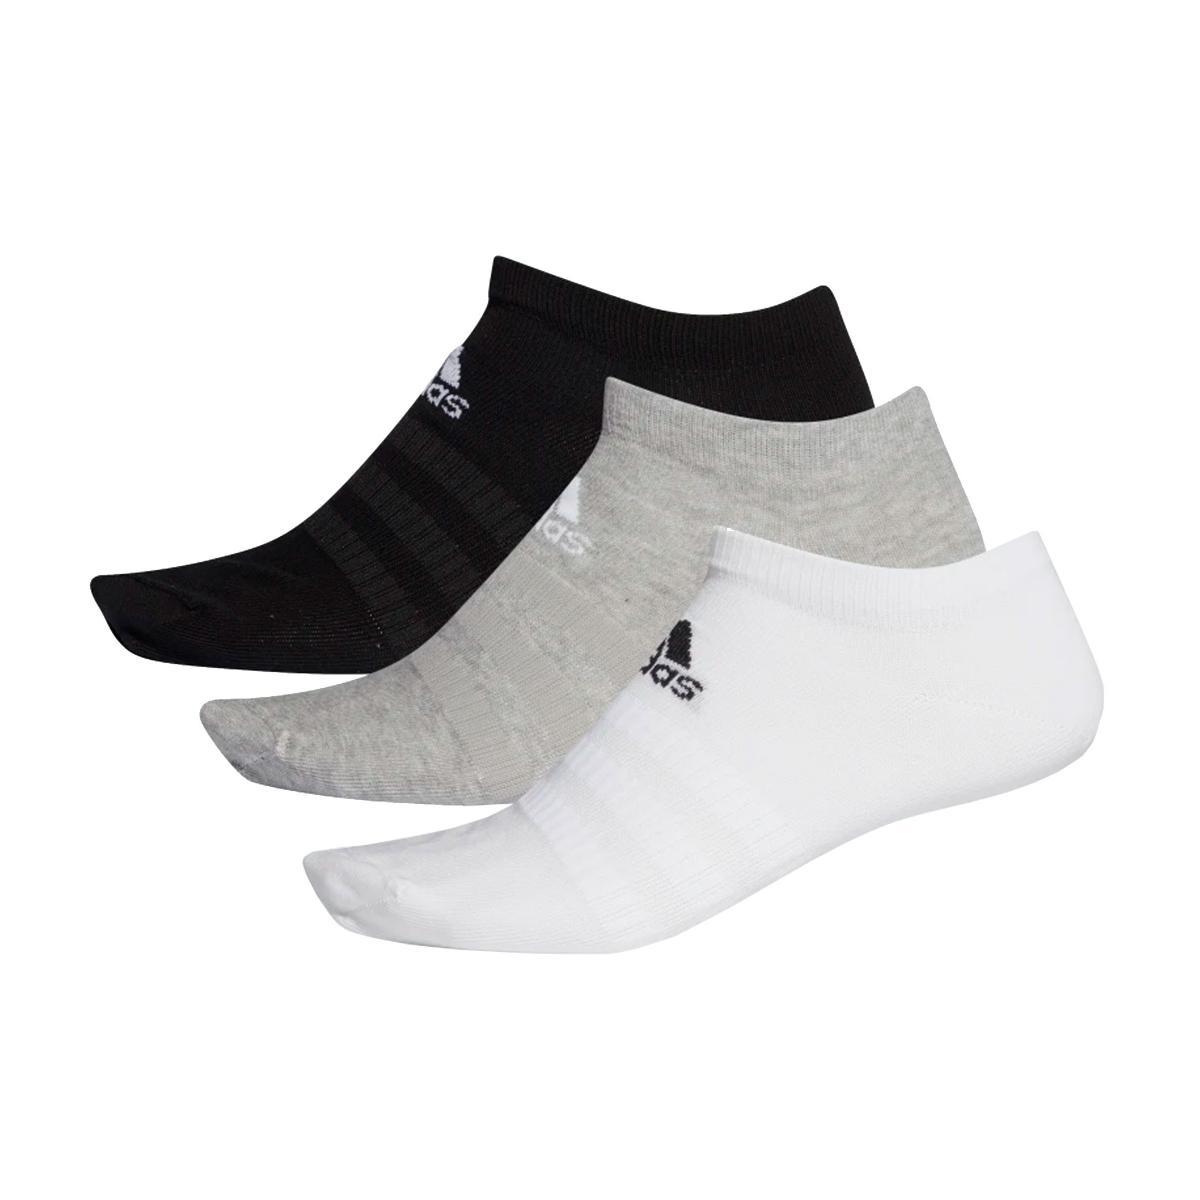 Calzini Adidas alla caviglia Low-Cut 3 pack (3 paia) unisex rif. DZ9400